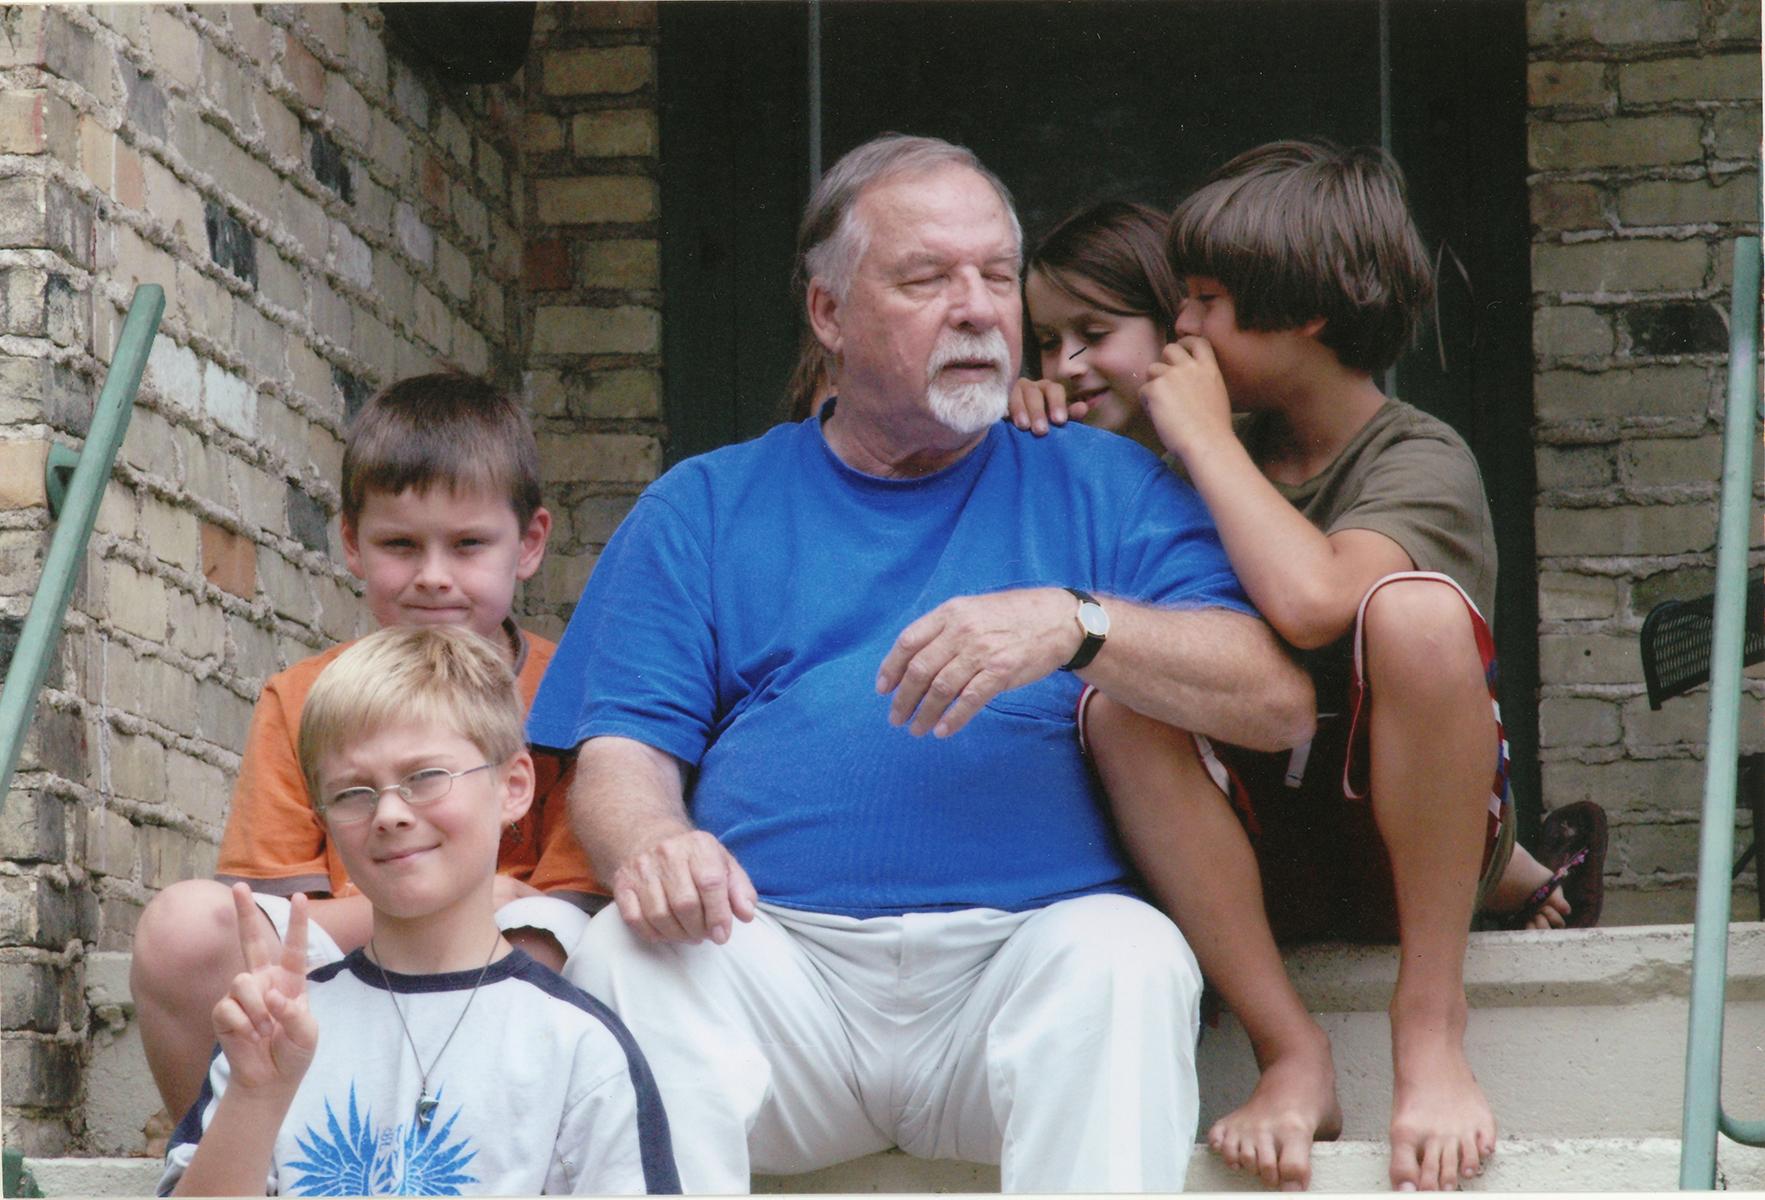 Andrew Carnegie Family Today 92300 | ENEWS